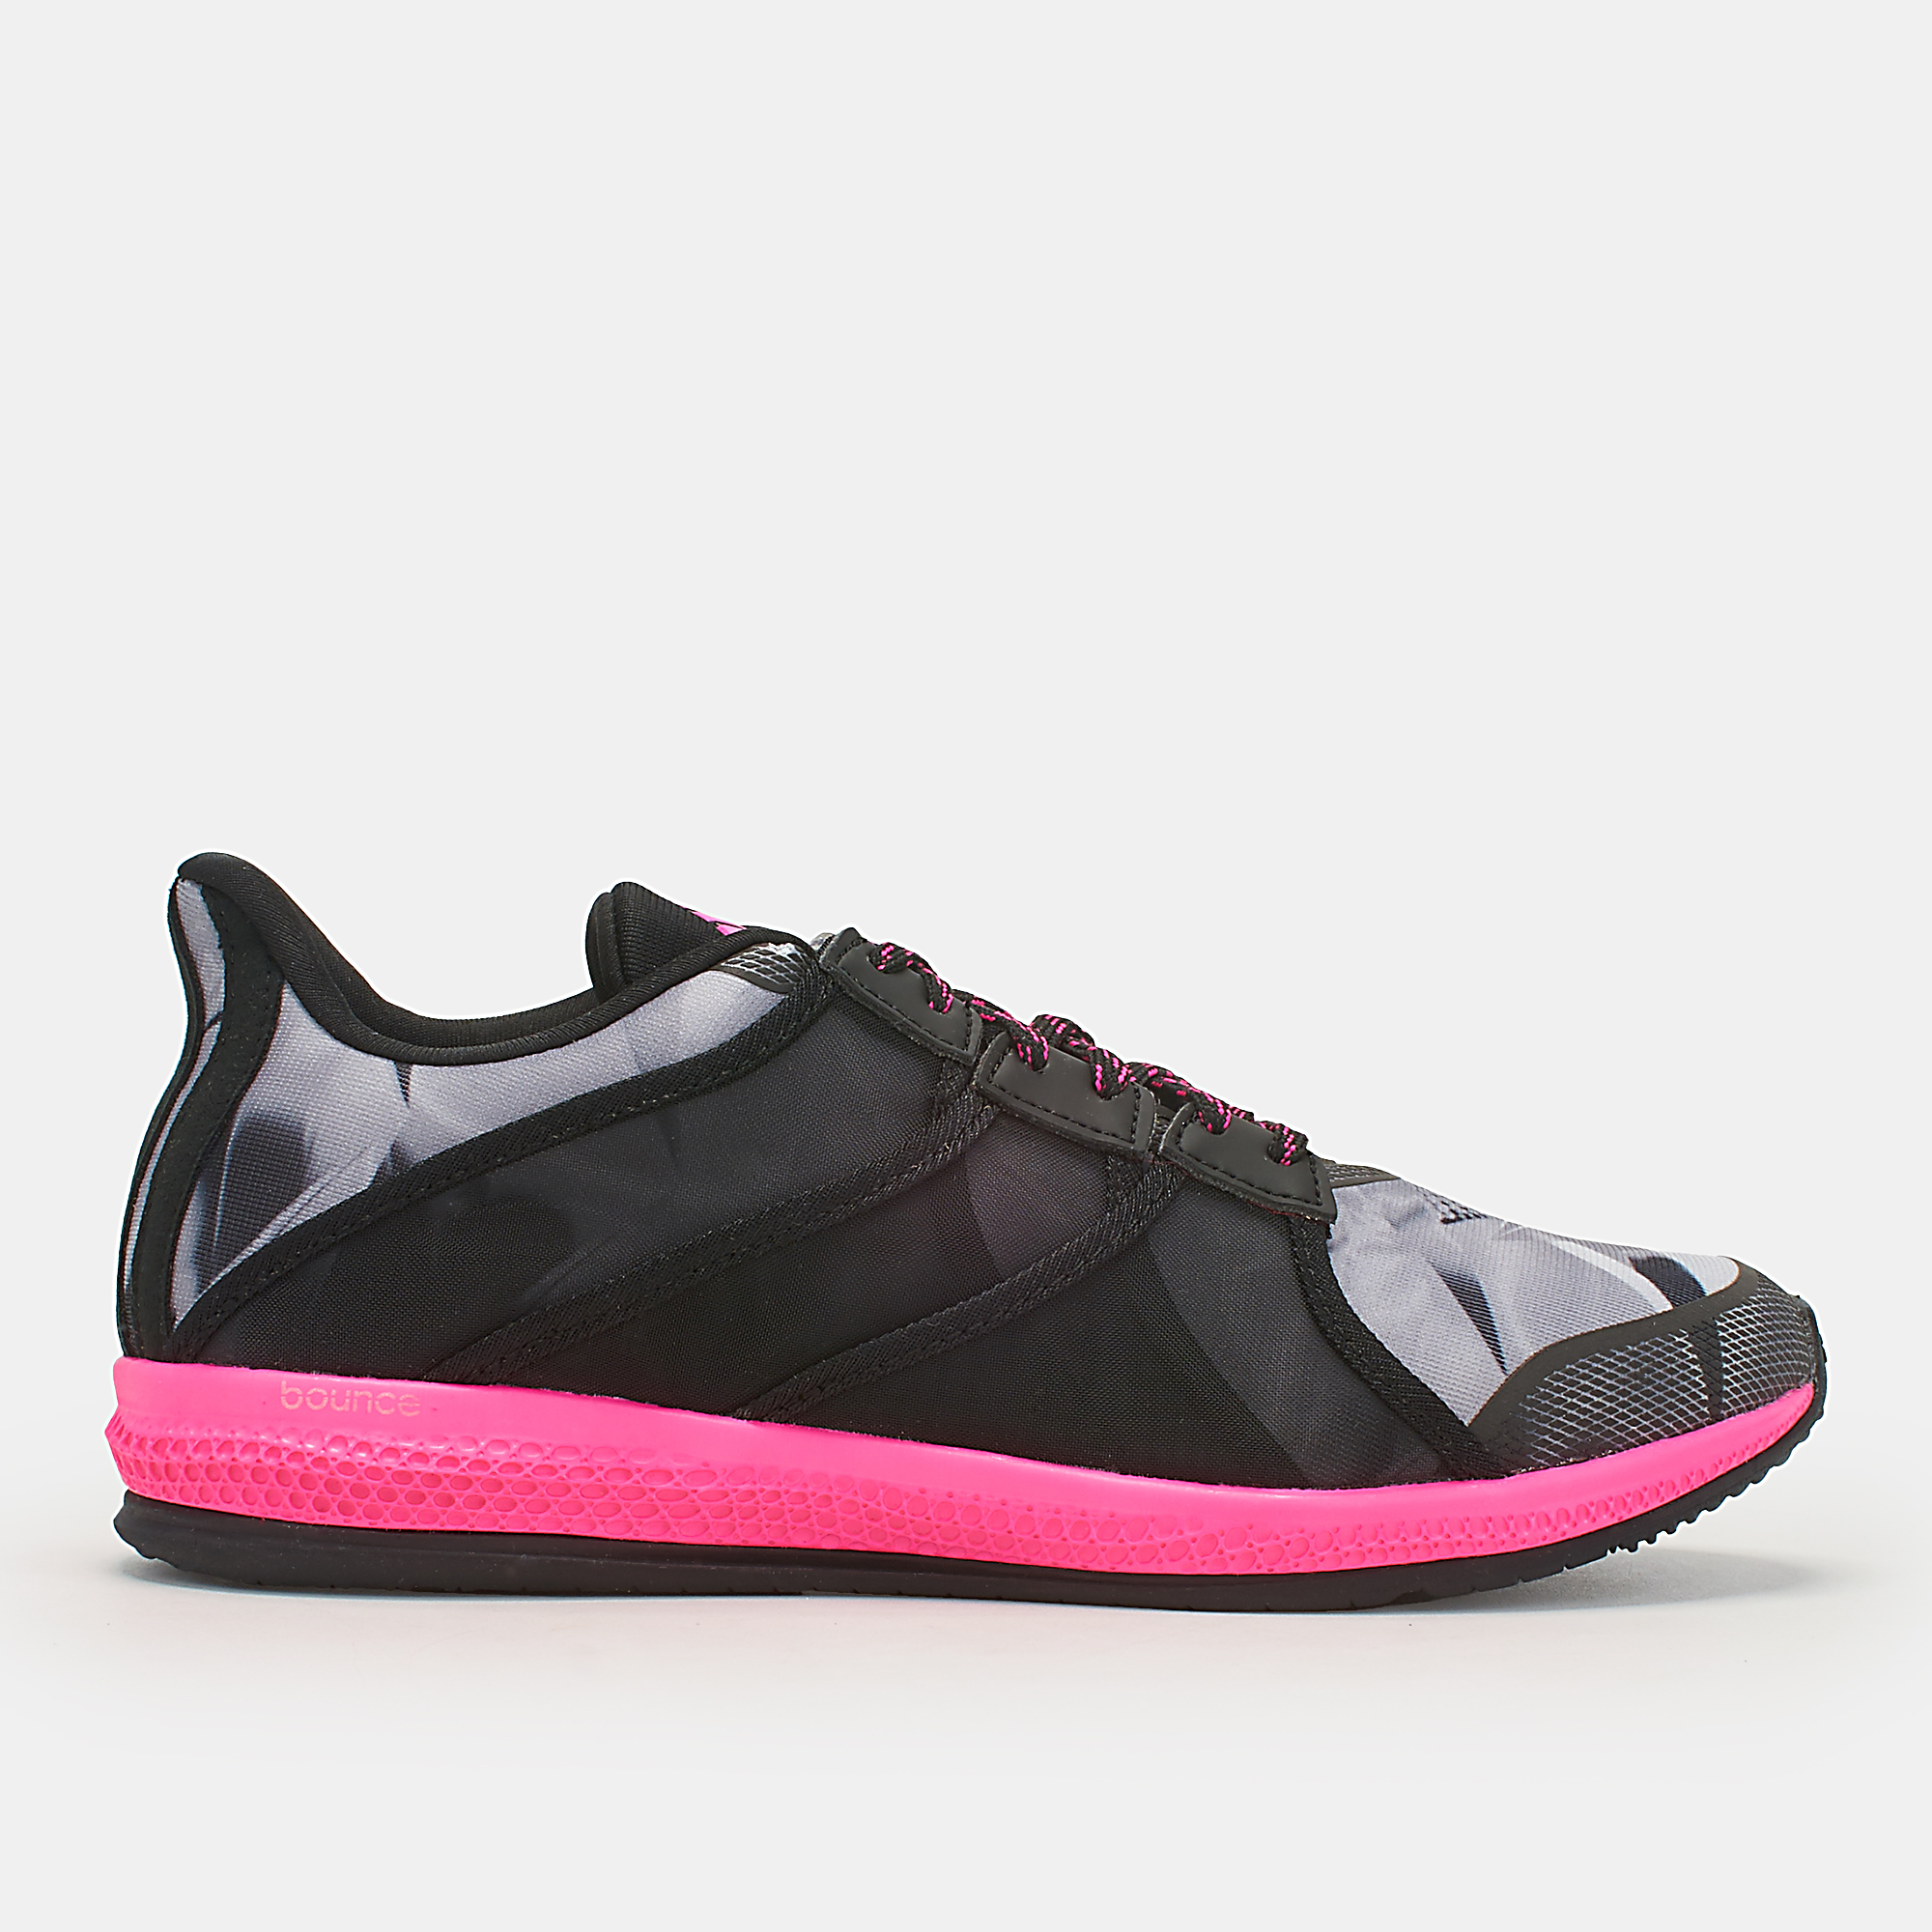 c8fe4dcd4 Shop Adidas Gymbreaker Bounce Training Shoe 34062